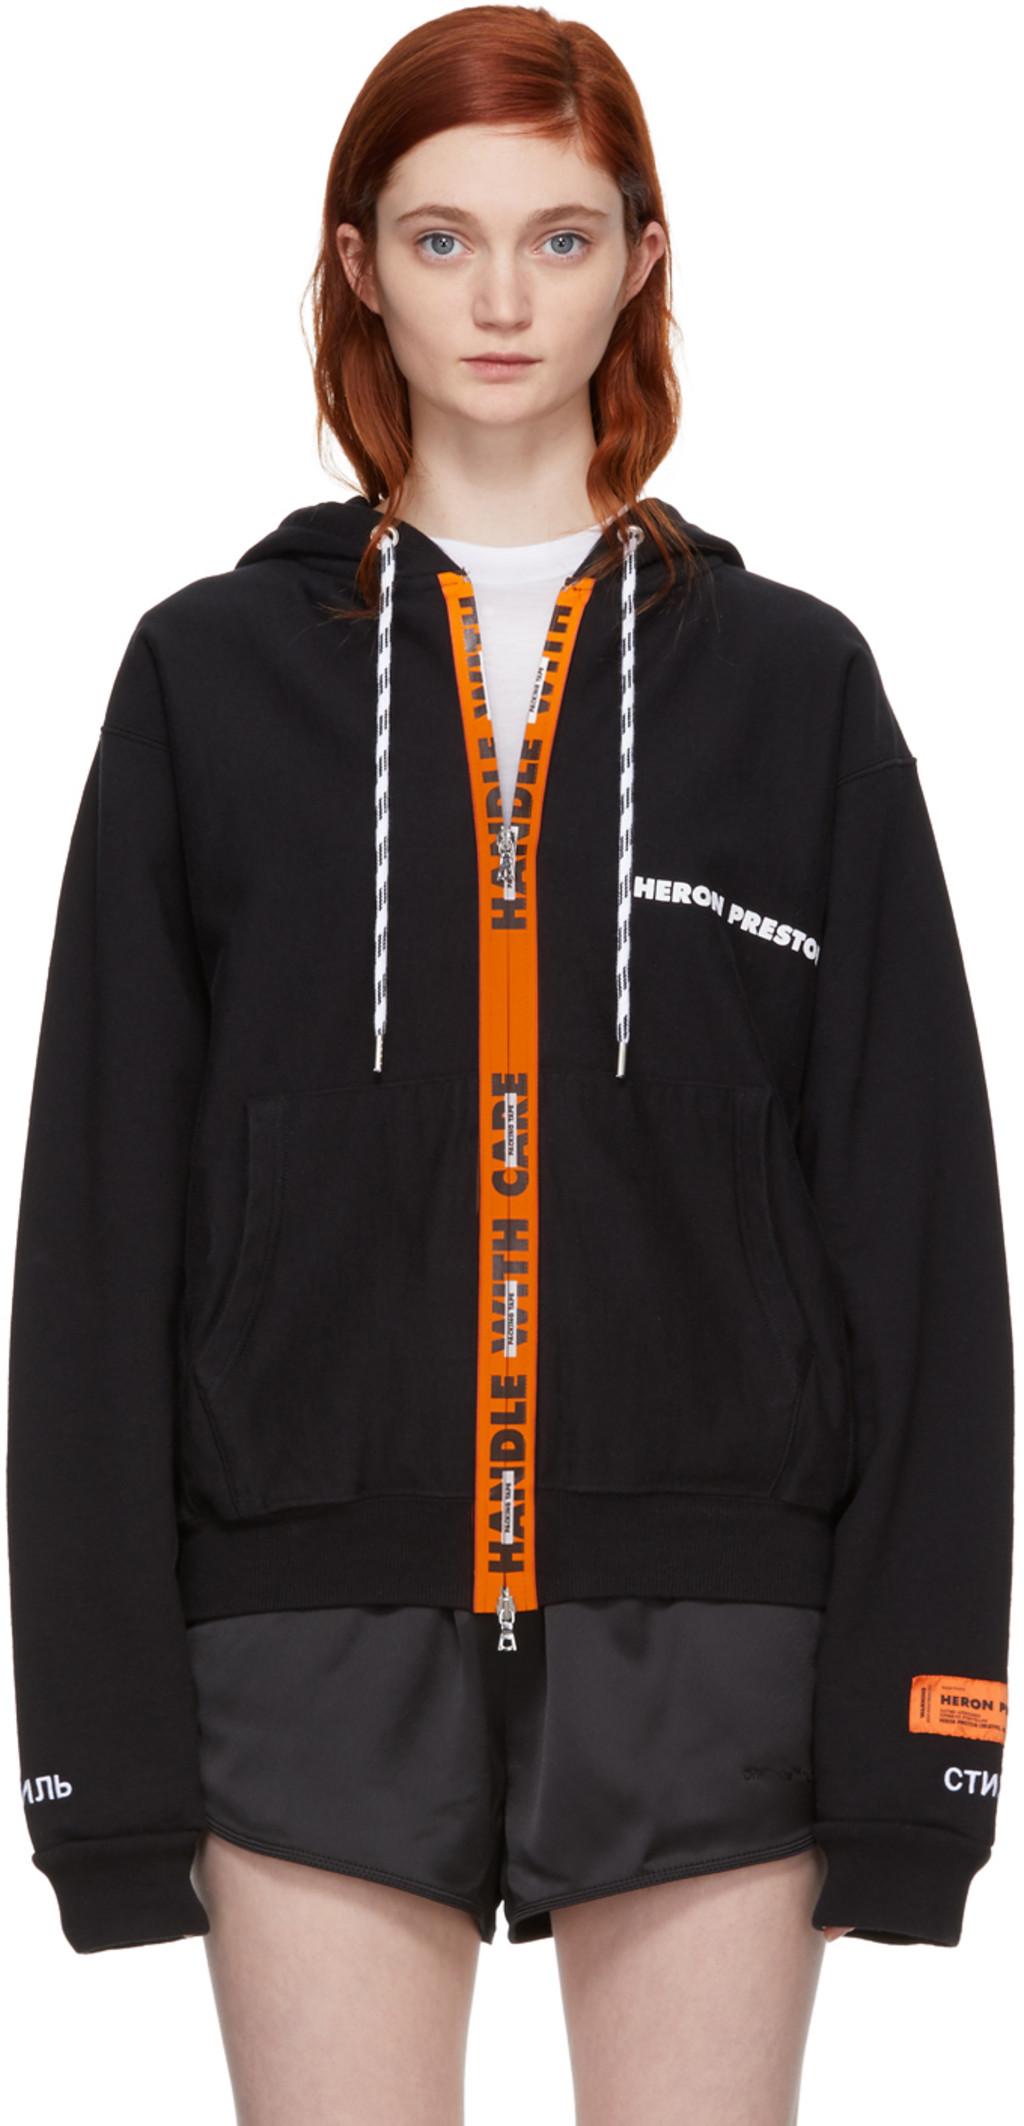 balenciaga hoodie womens orange